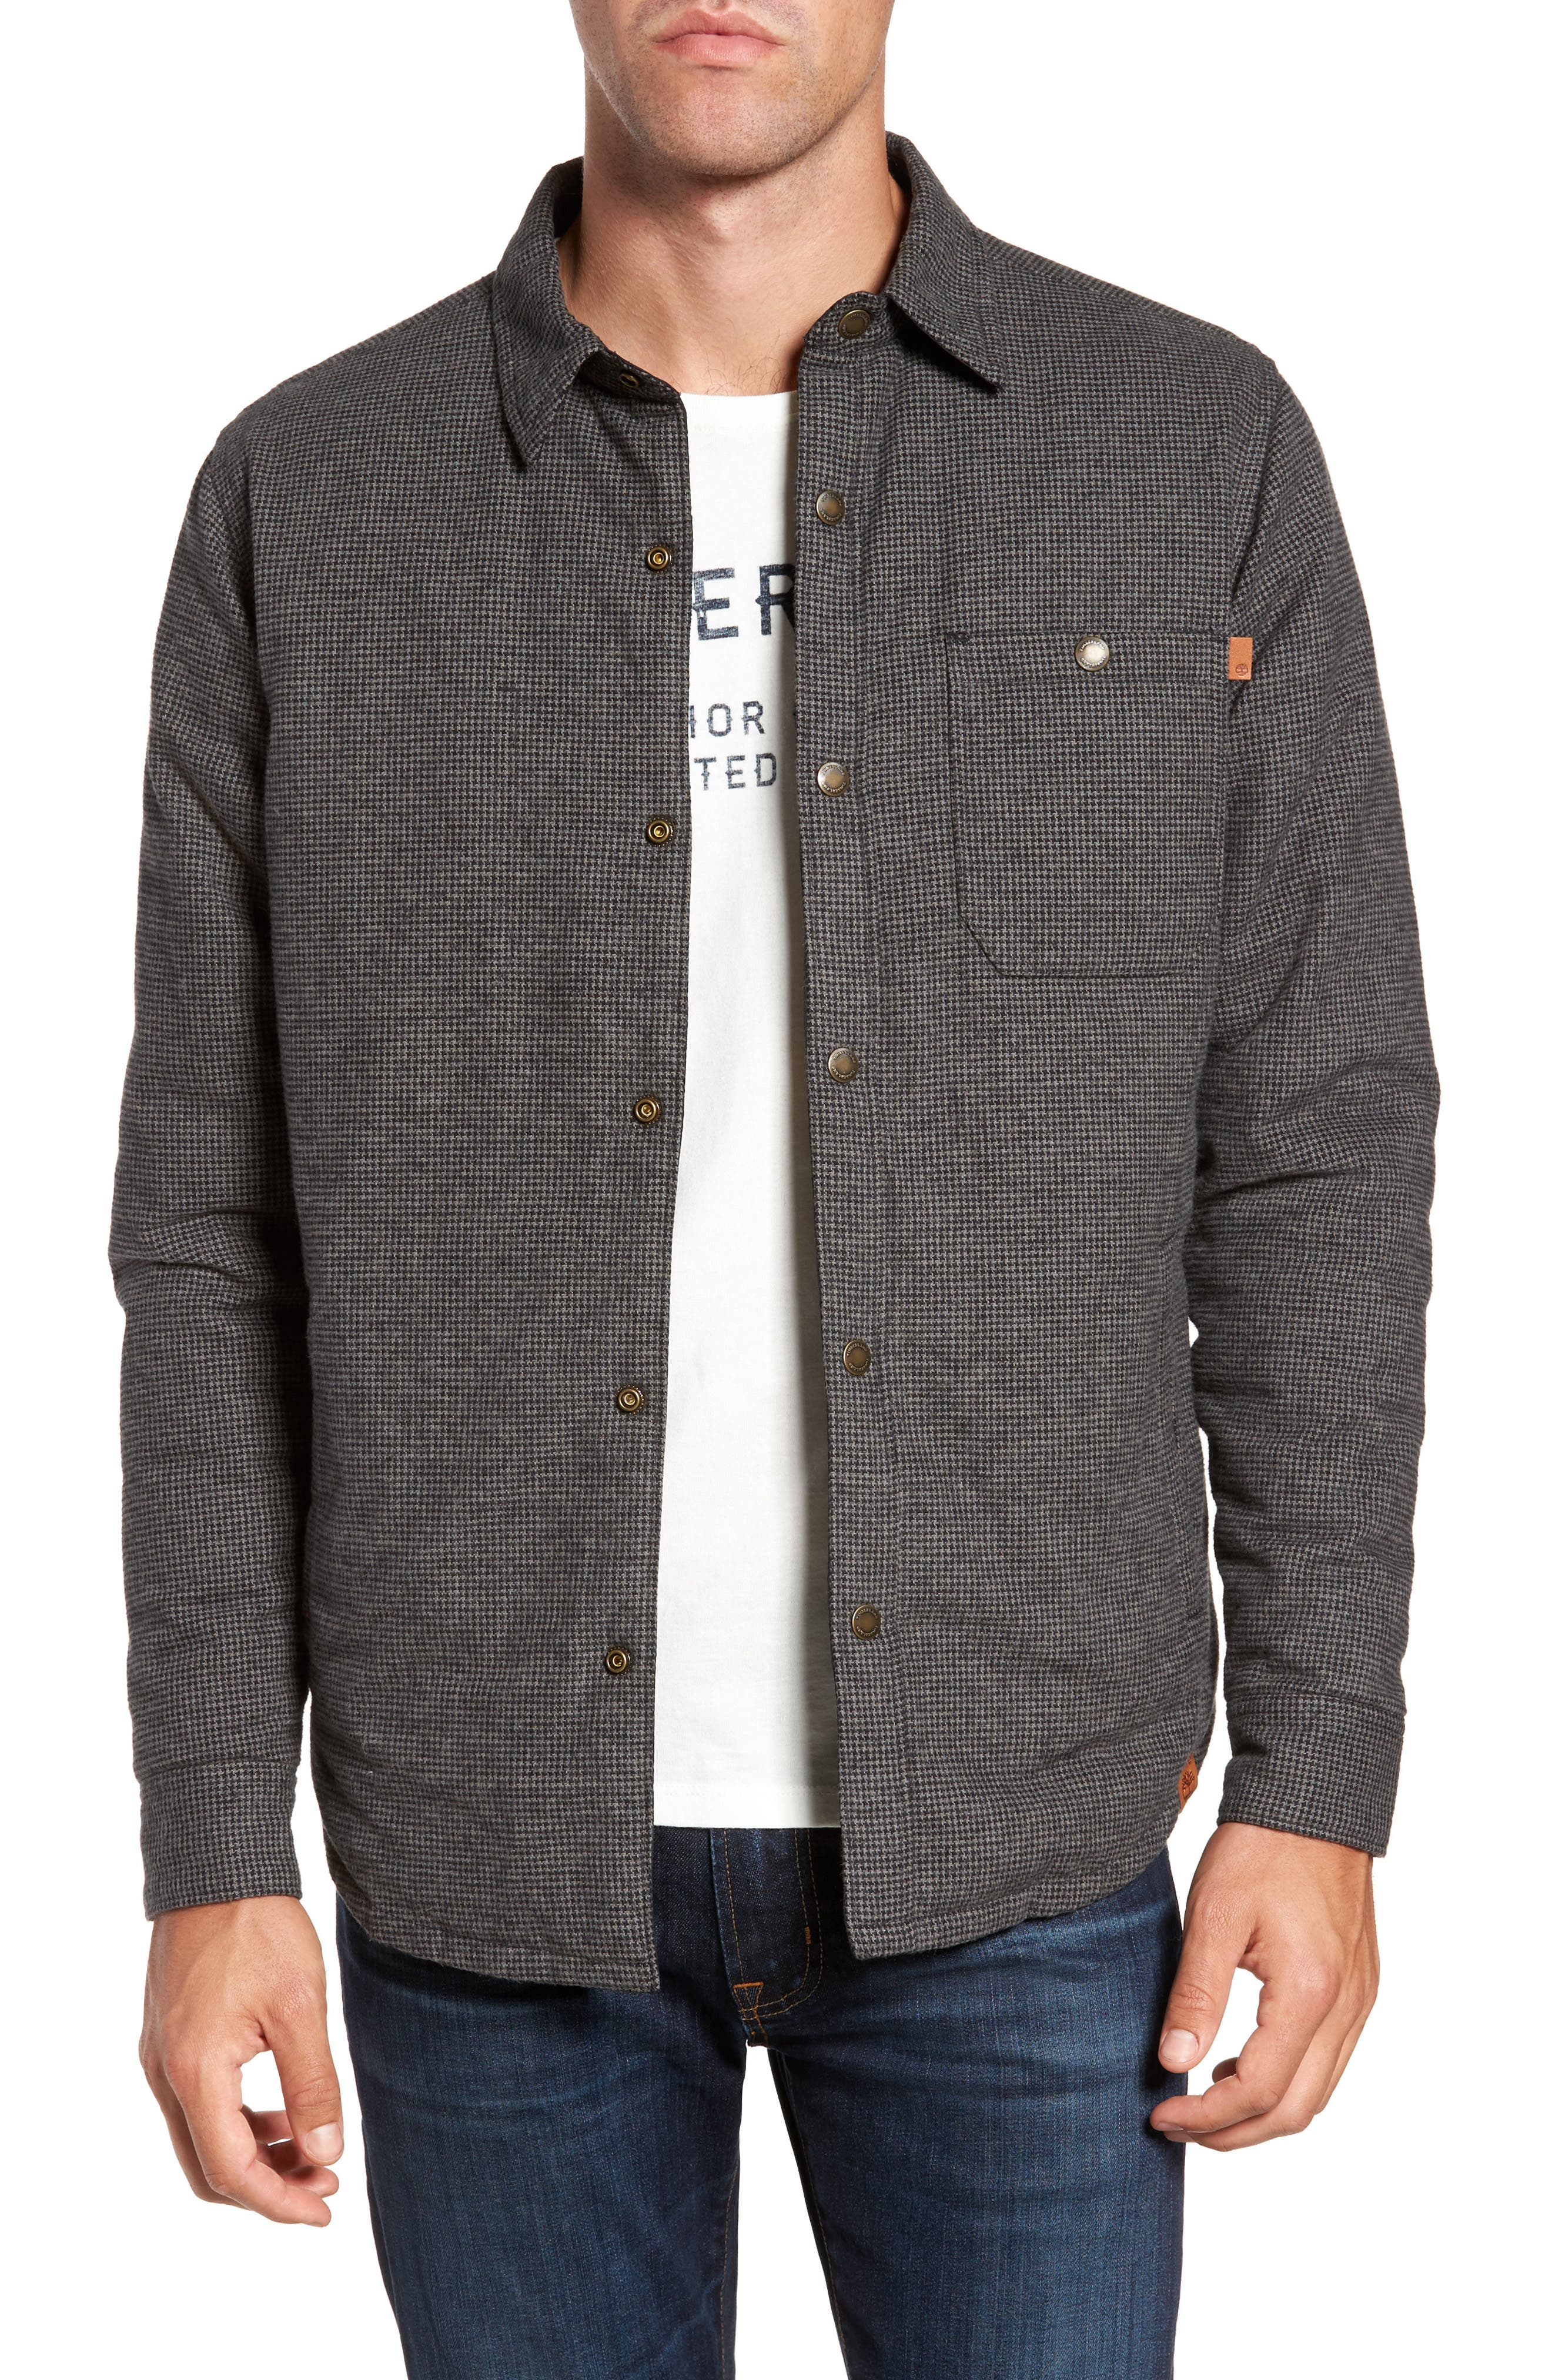 Alternate Image 1 Selected - Timberland Gunstock River Reversible Down Shirt Jacket